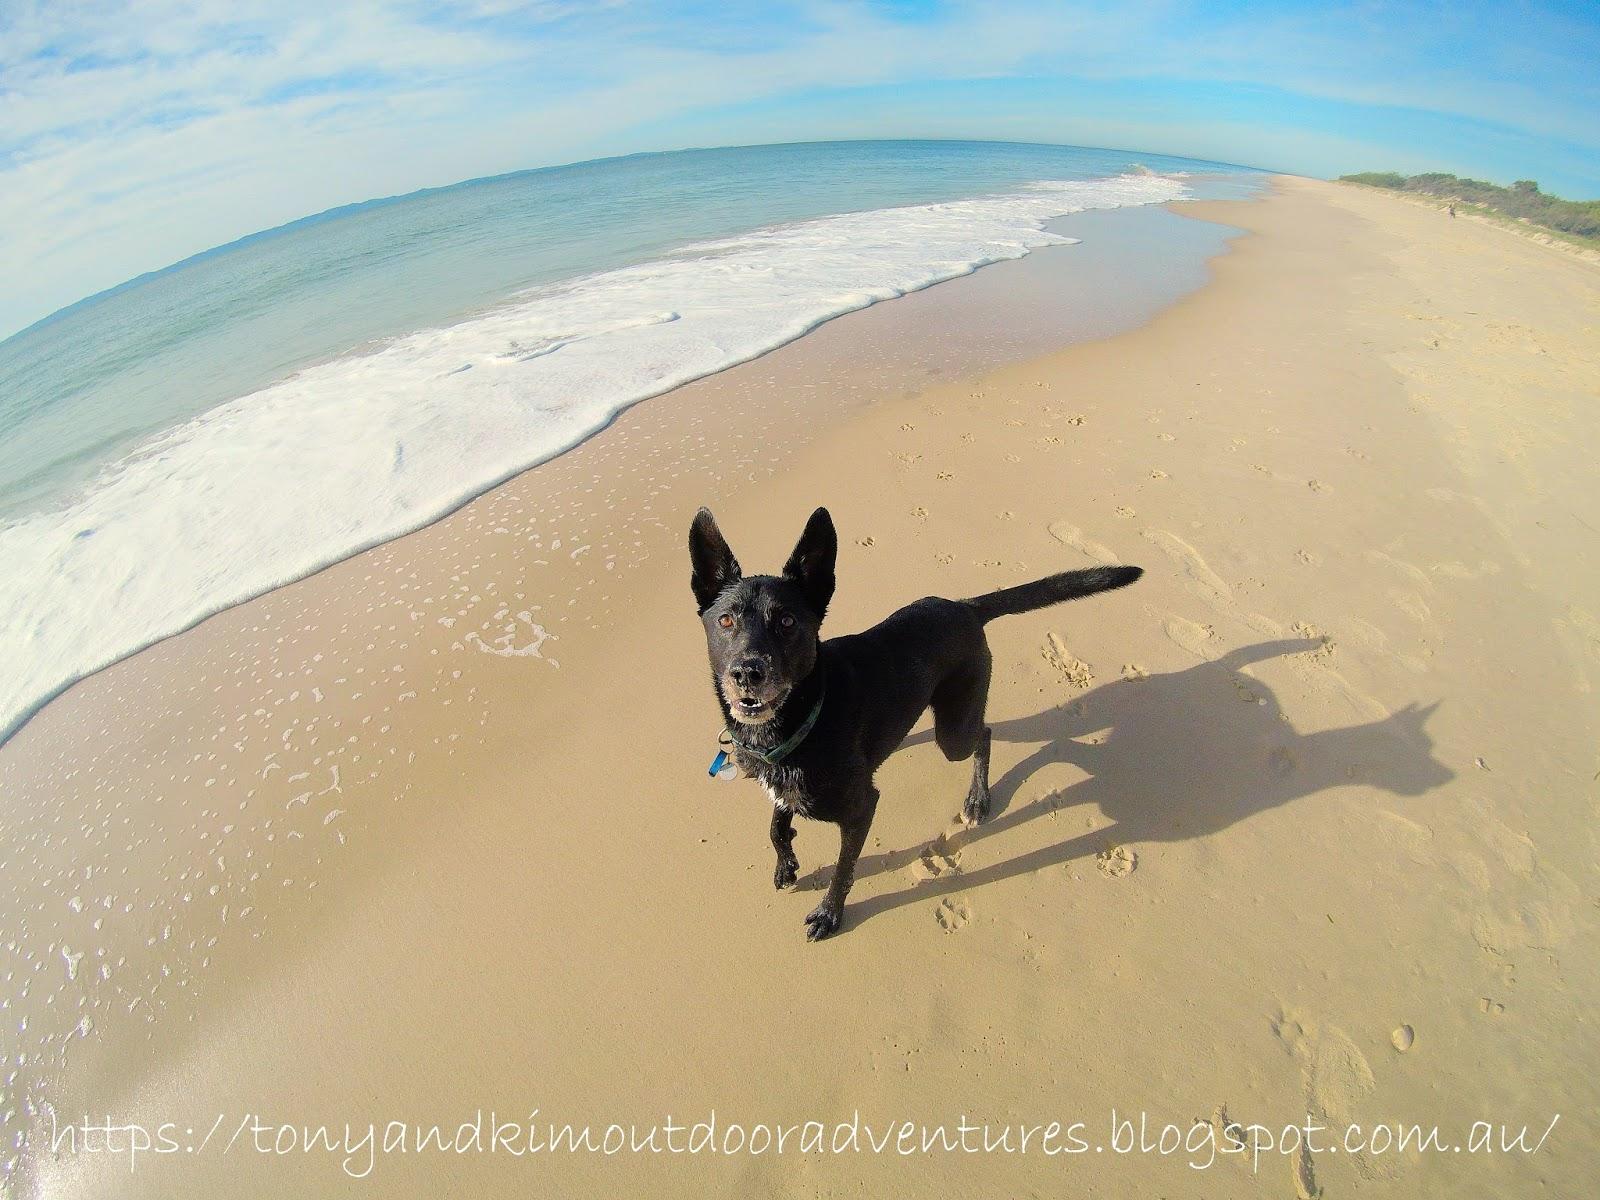 RED BEACH, BRIBIE ISLAND - Tony and Kim + Shari Outdoor